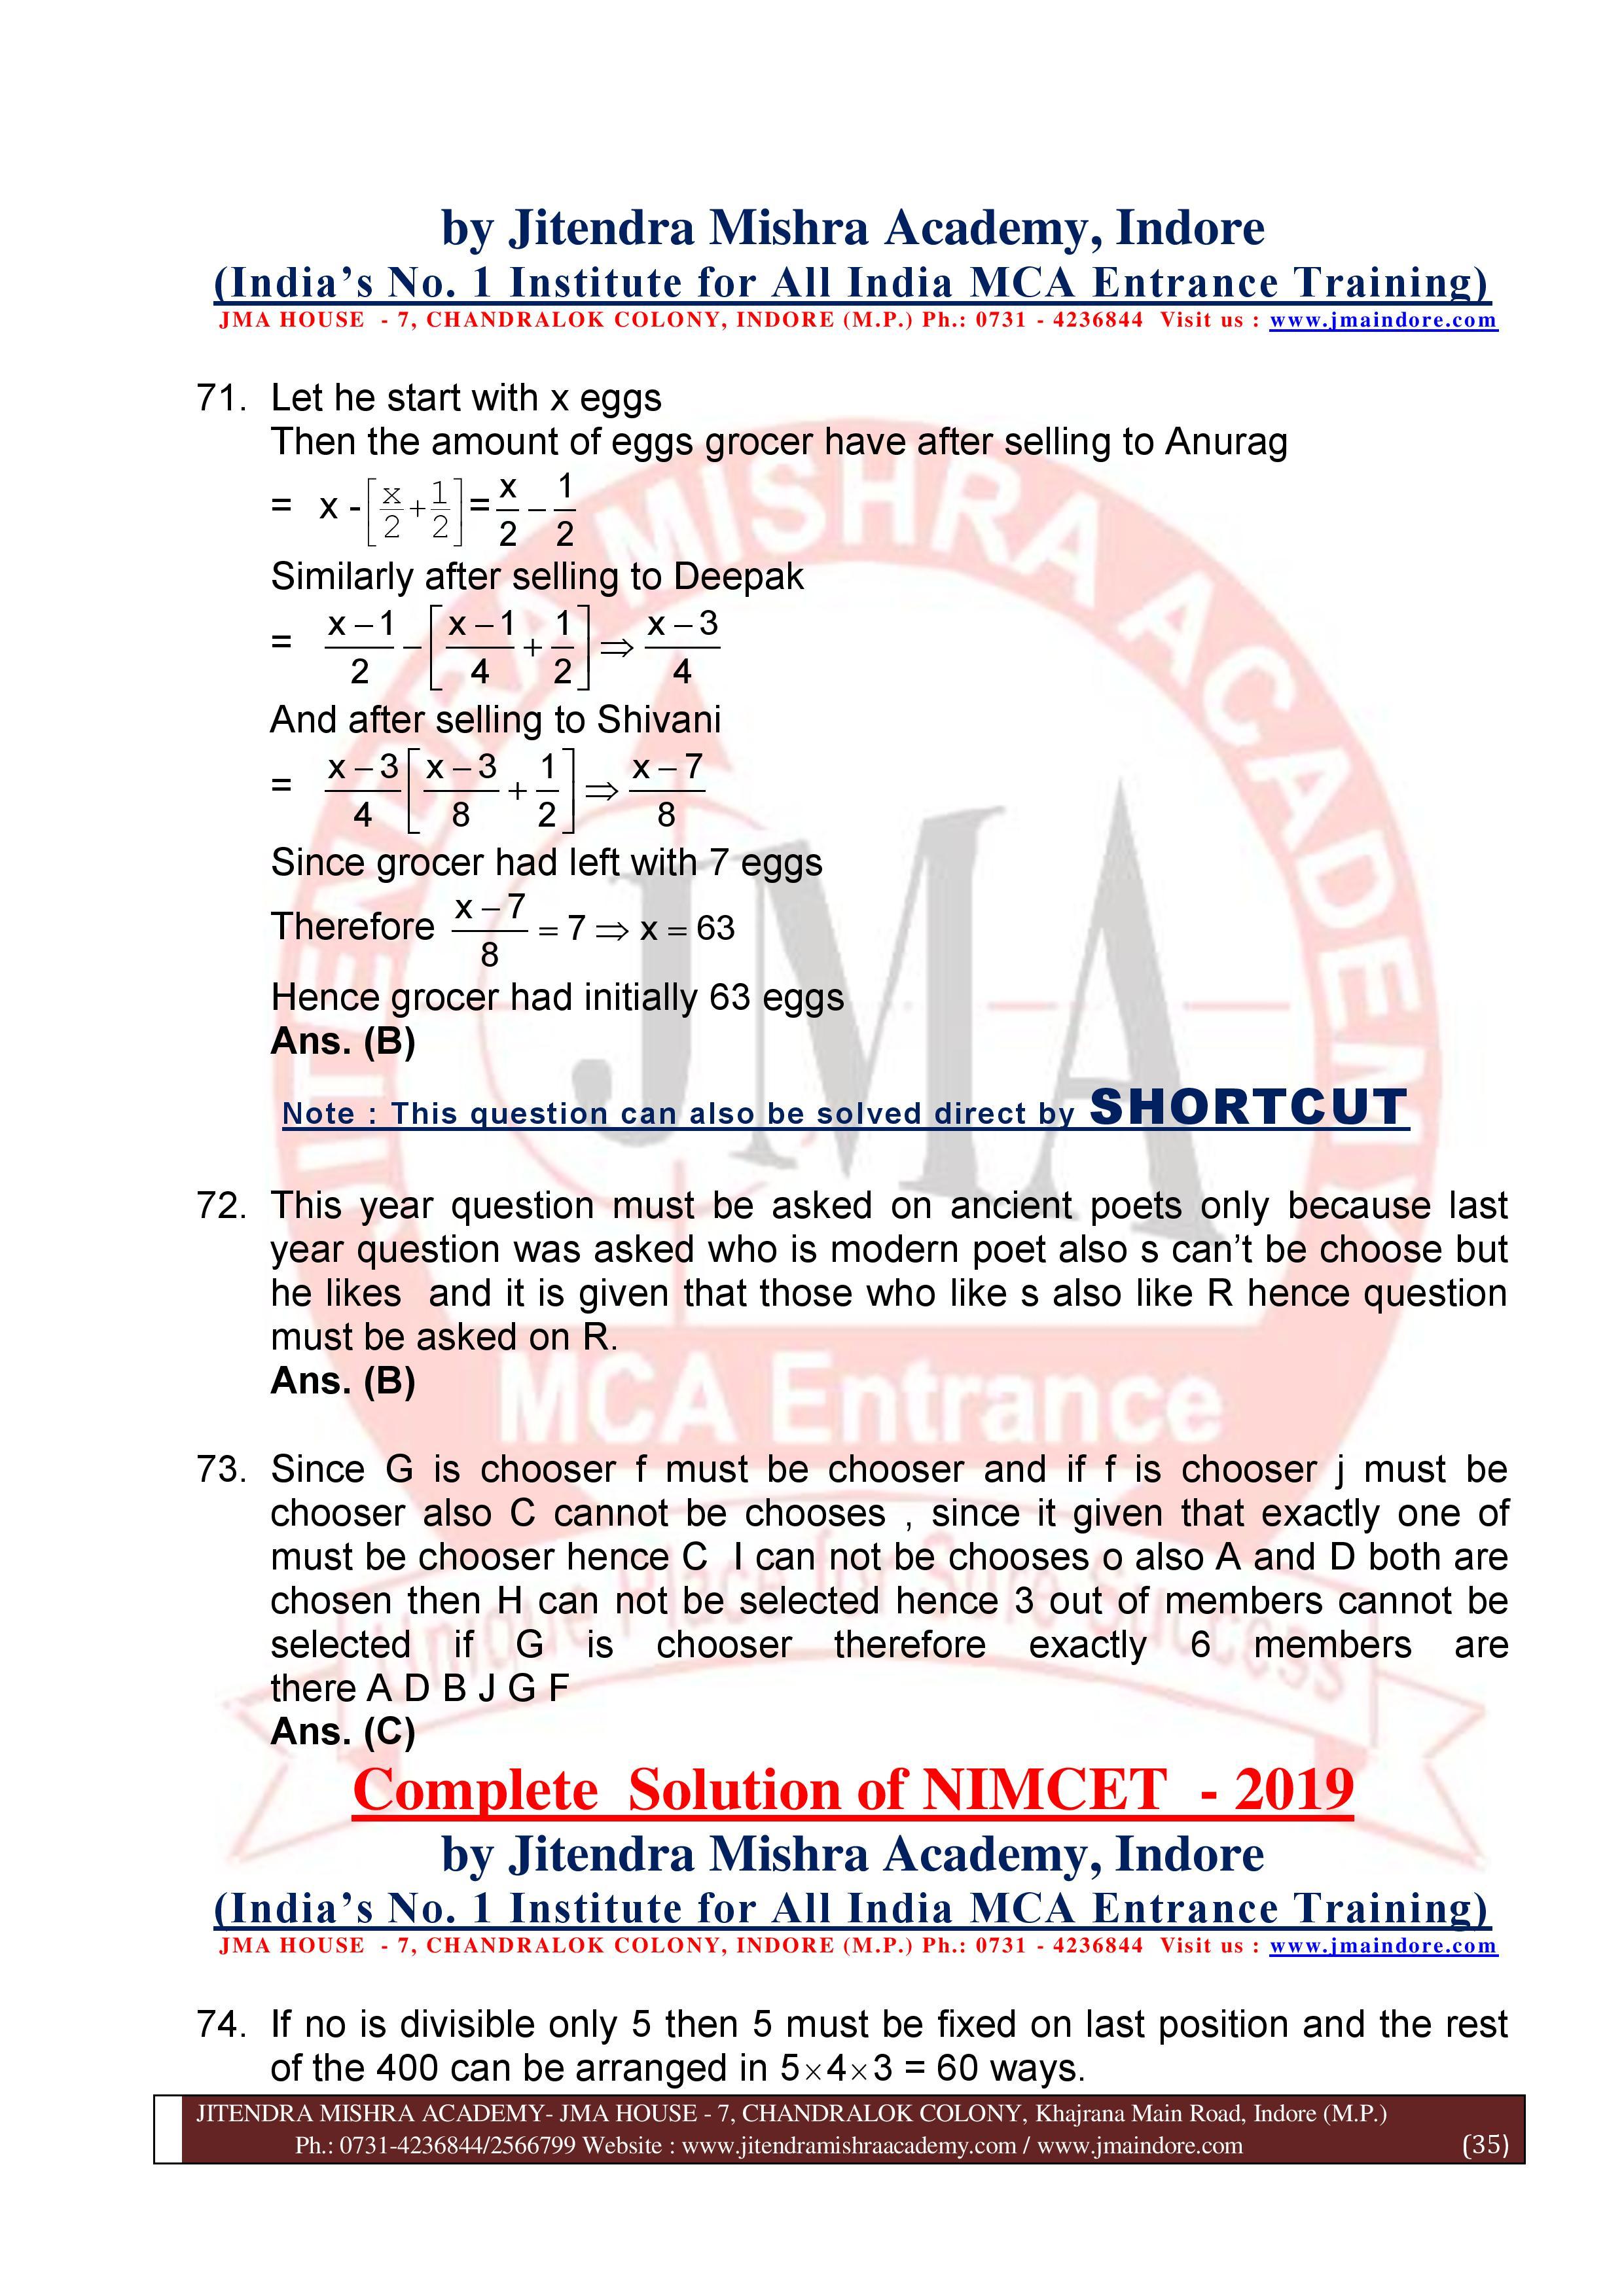 NIMCET 2019 SOLUTION (SET - A)-page-035